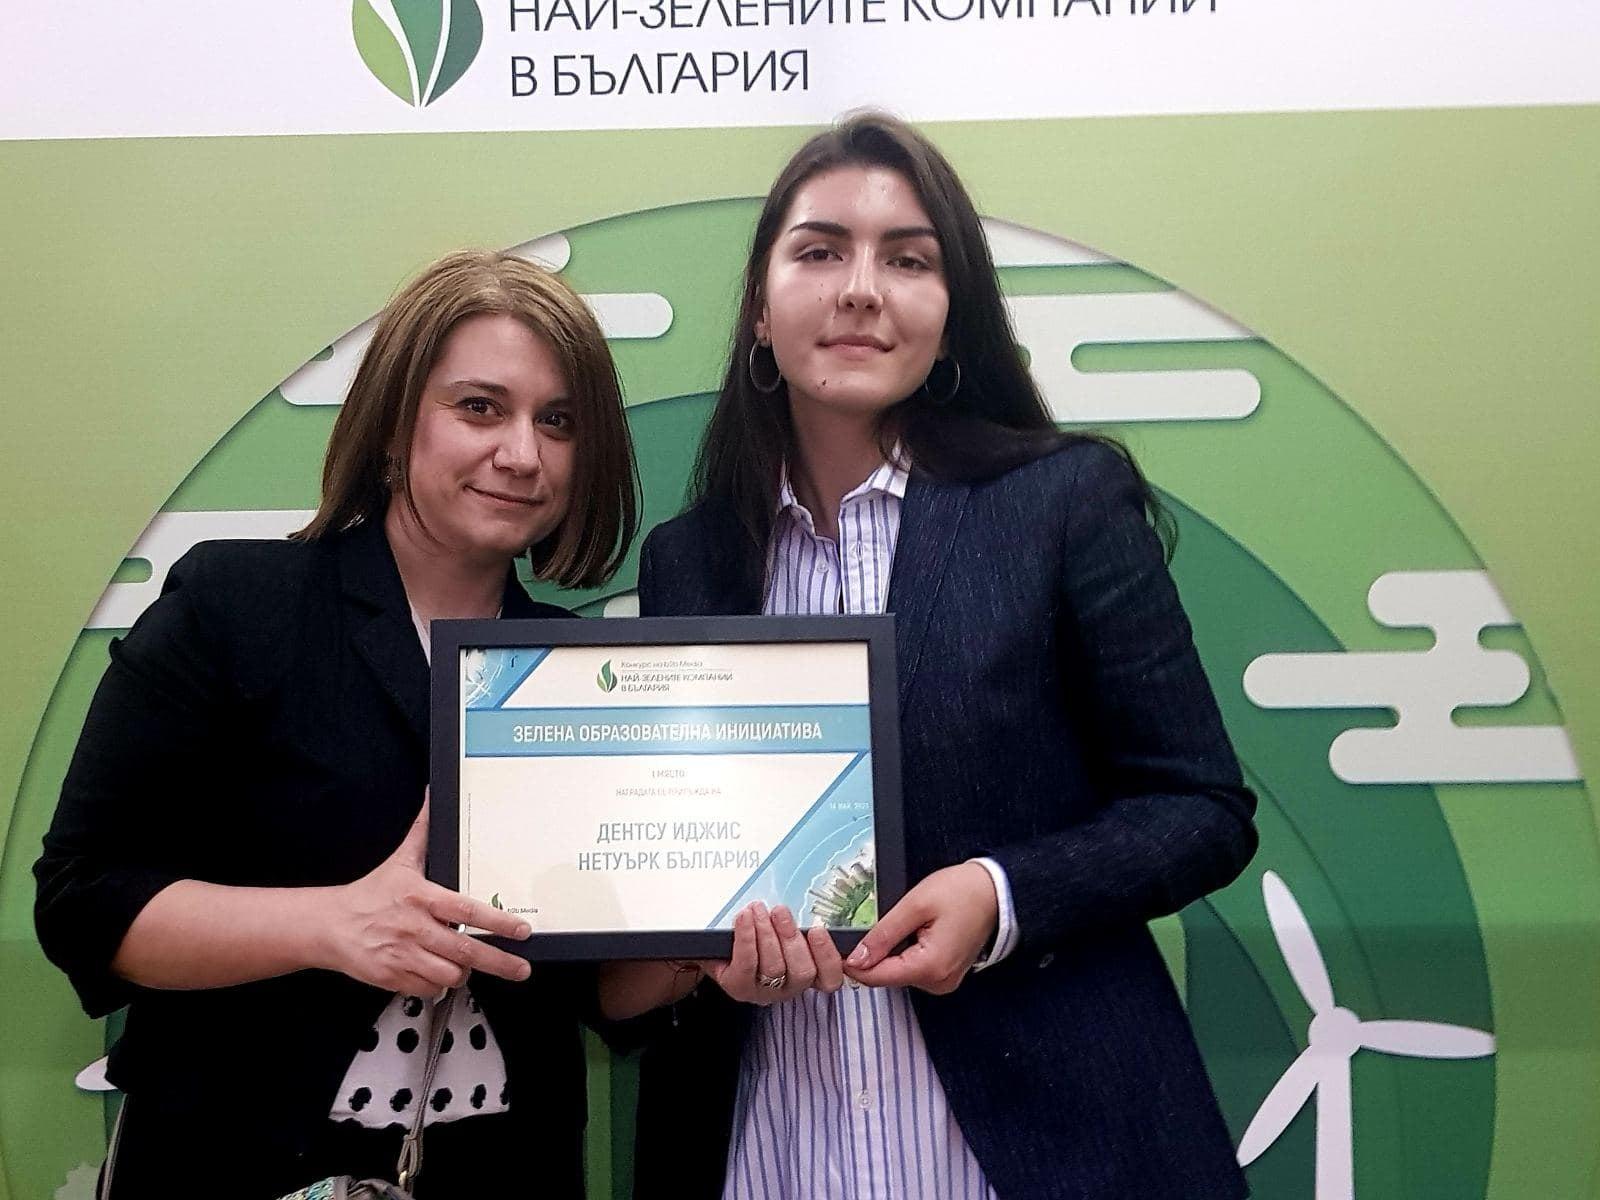 Rumiana Yakimova and Ivana Popova from dentsu Bulgaria received the award for Best Educational Campaign in Bulgaria in B2B Media Awards.